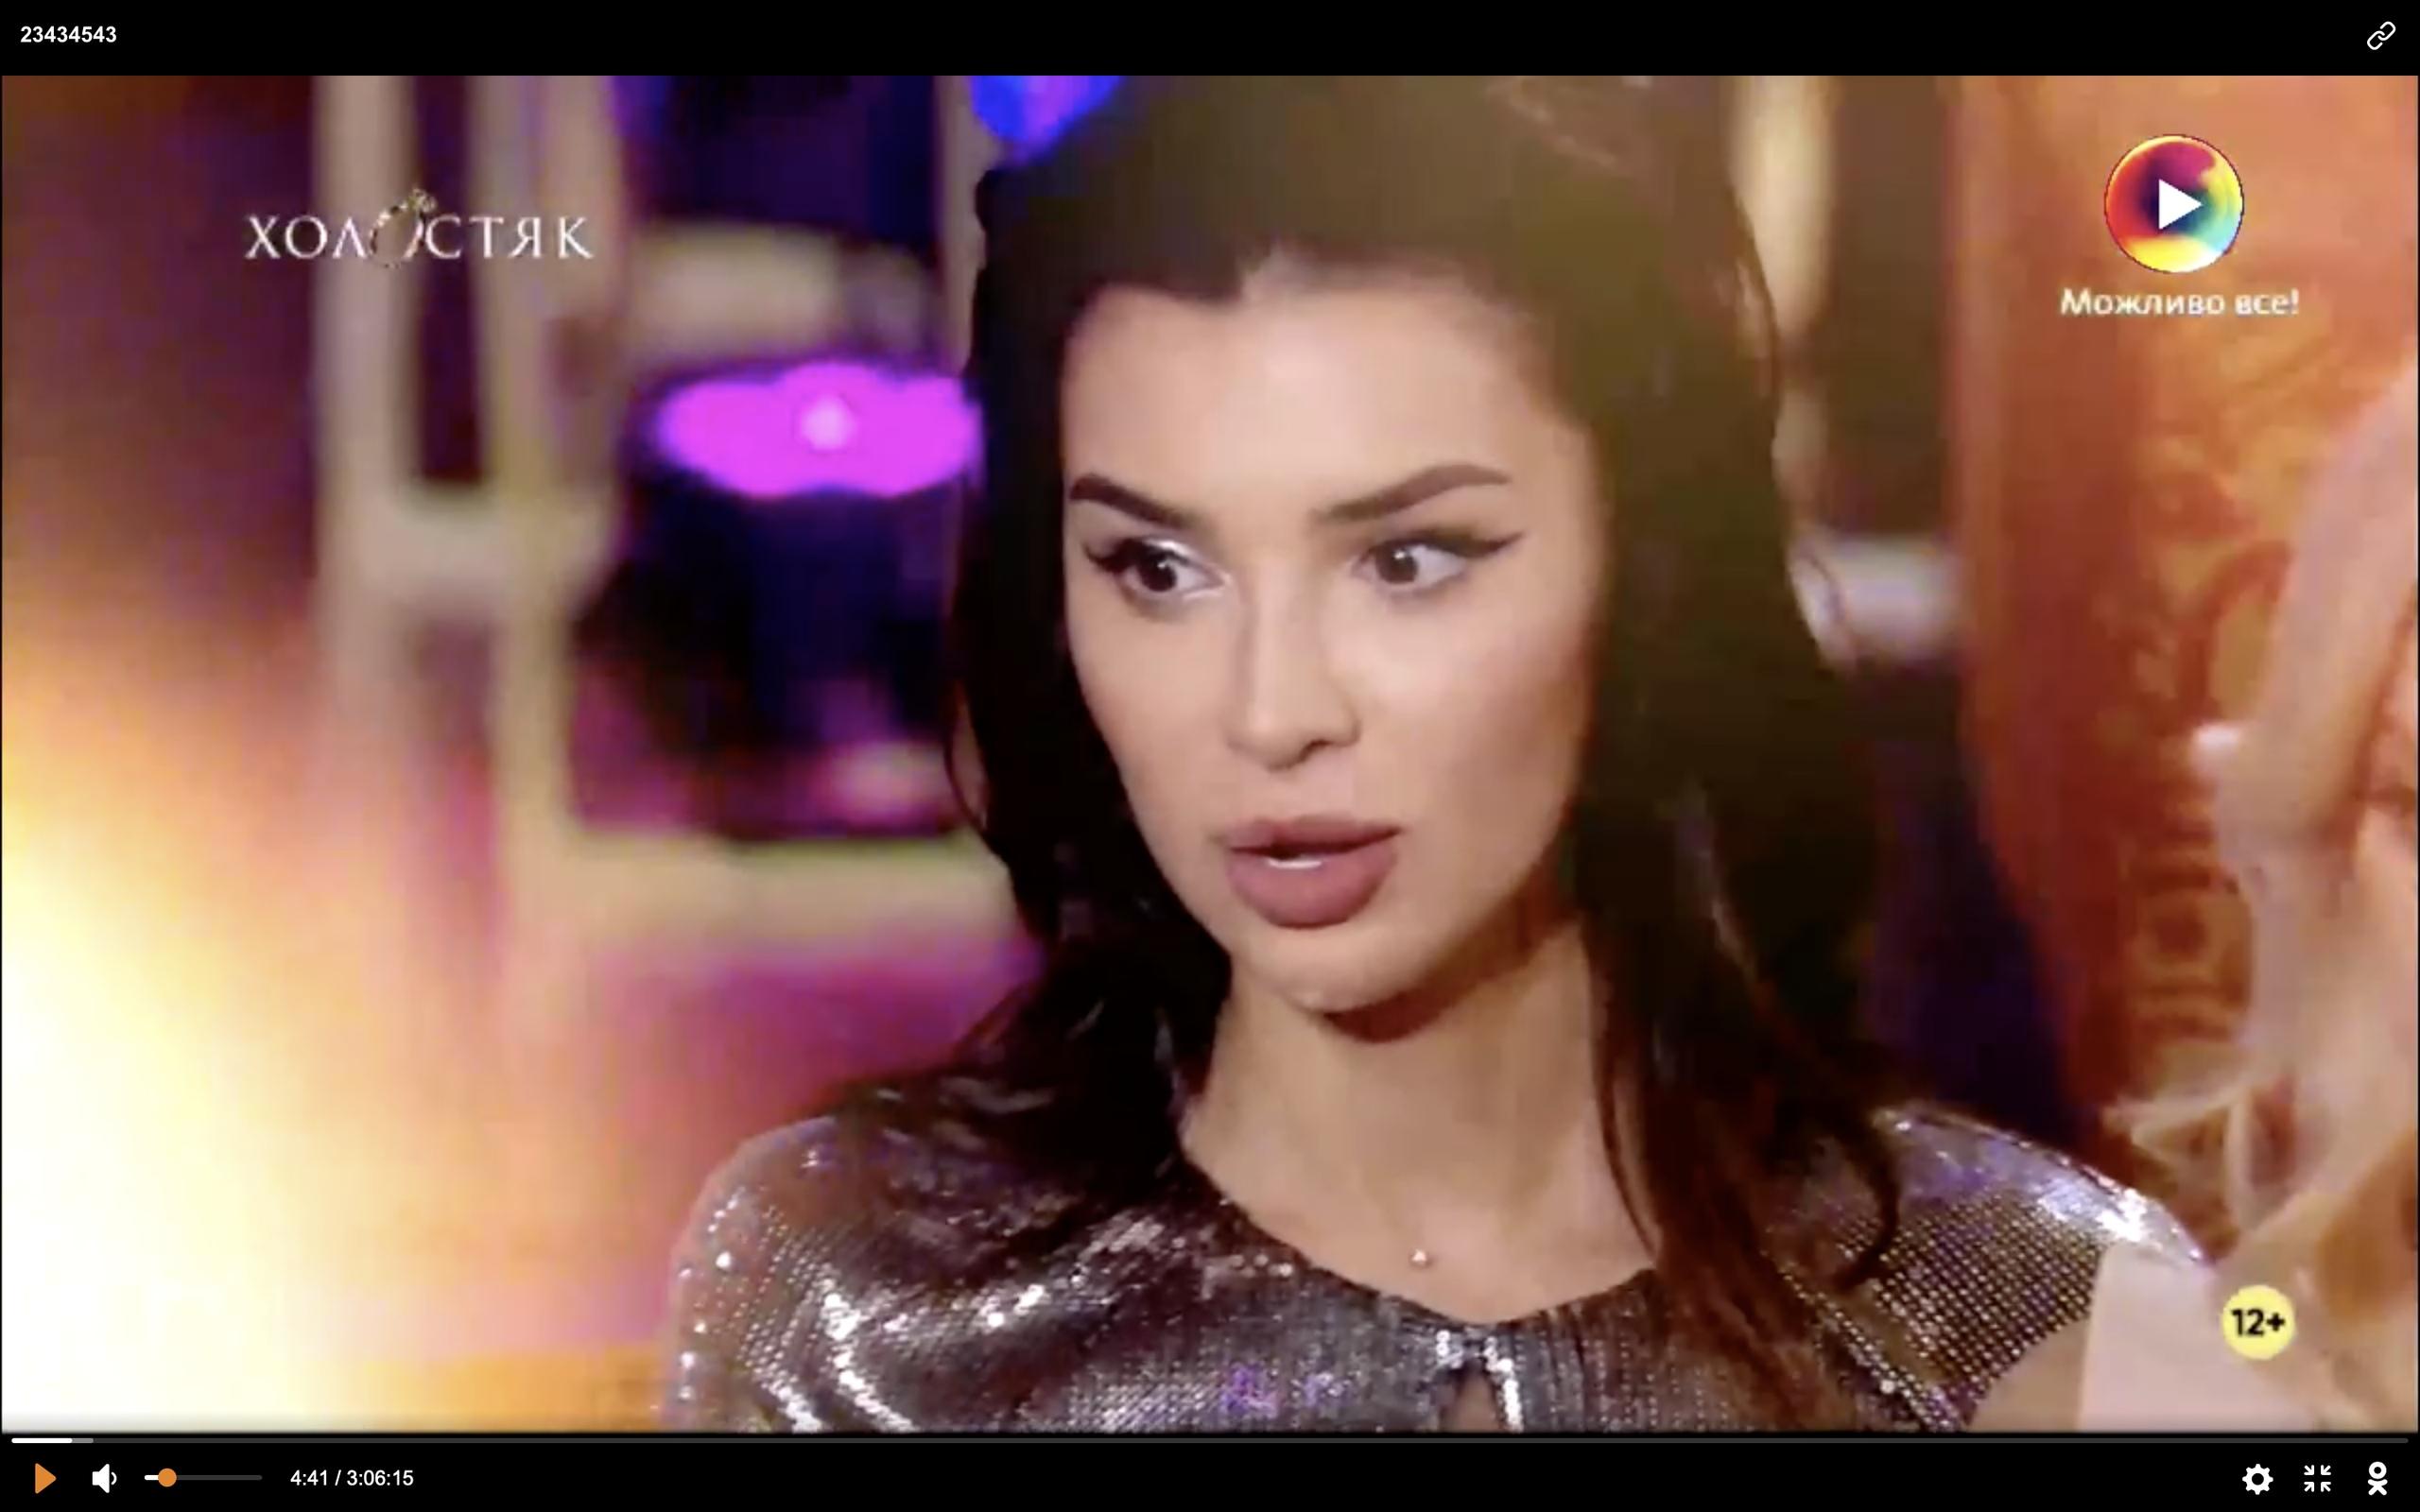 Bachelor Ukraine - Season 10 - Max Mihailuk - Episodes  - *Sleuthing Spoilers* - Page 2 RTPBhyp4E3s